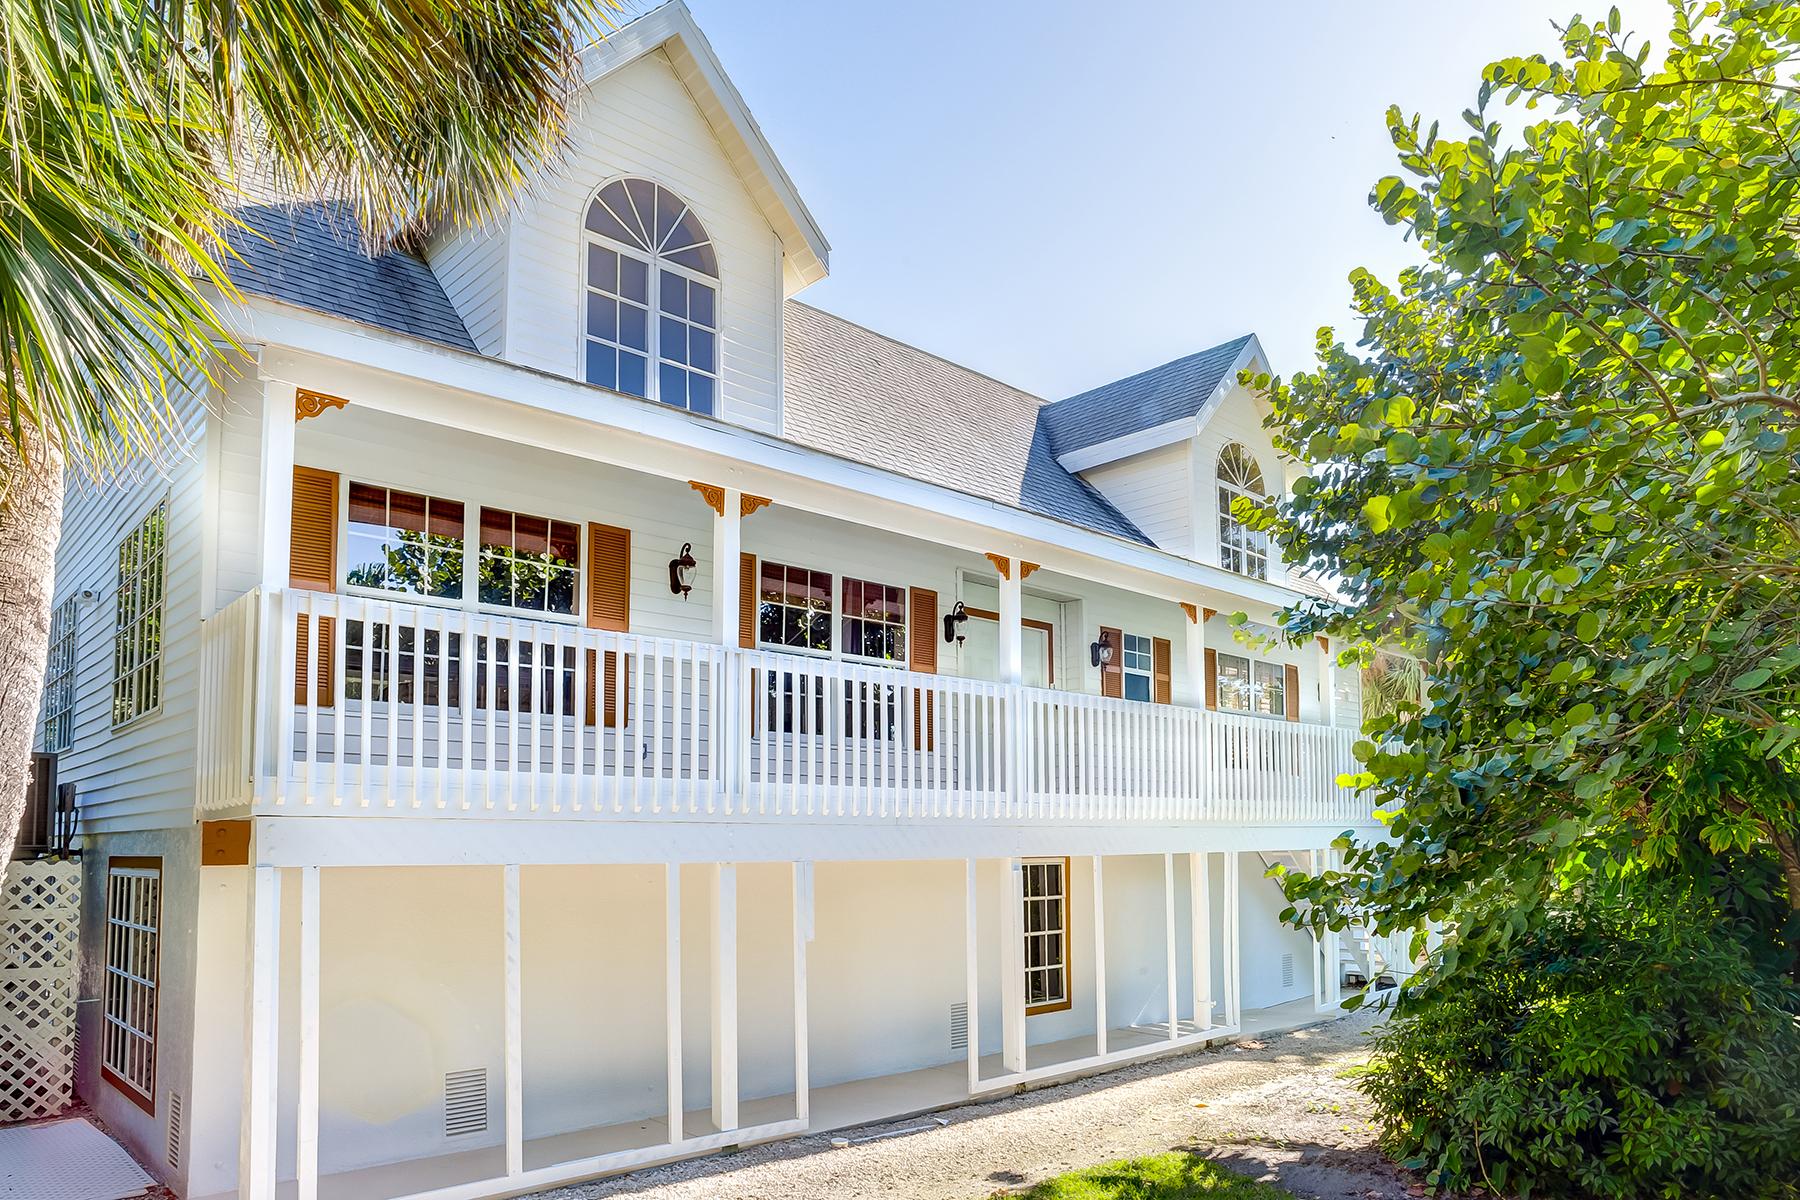 Villa per Vendita alle ore SANIBEL 1943 Sanibel Bayou Rd Sanibel, Florida, 33957 Stati Uniti